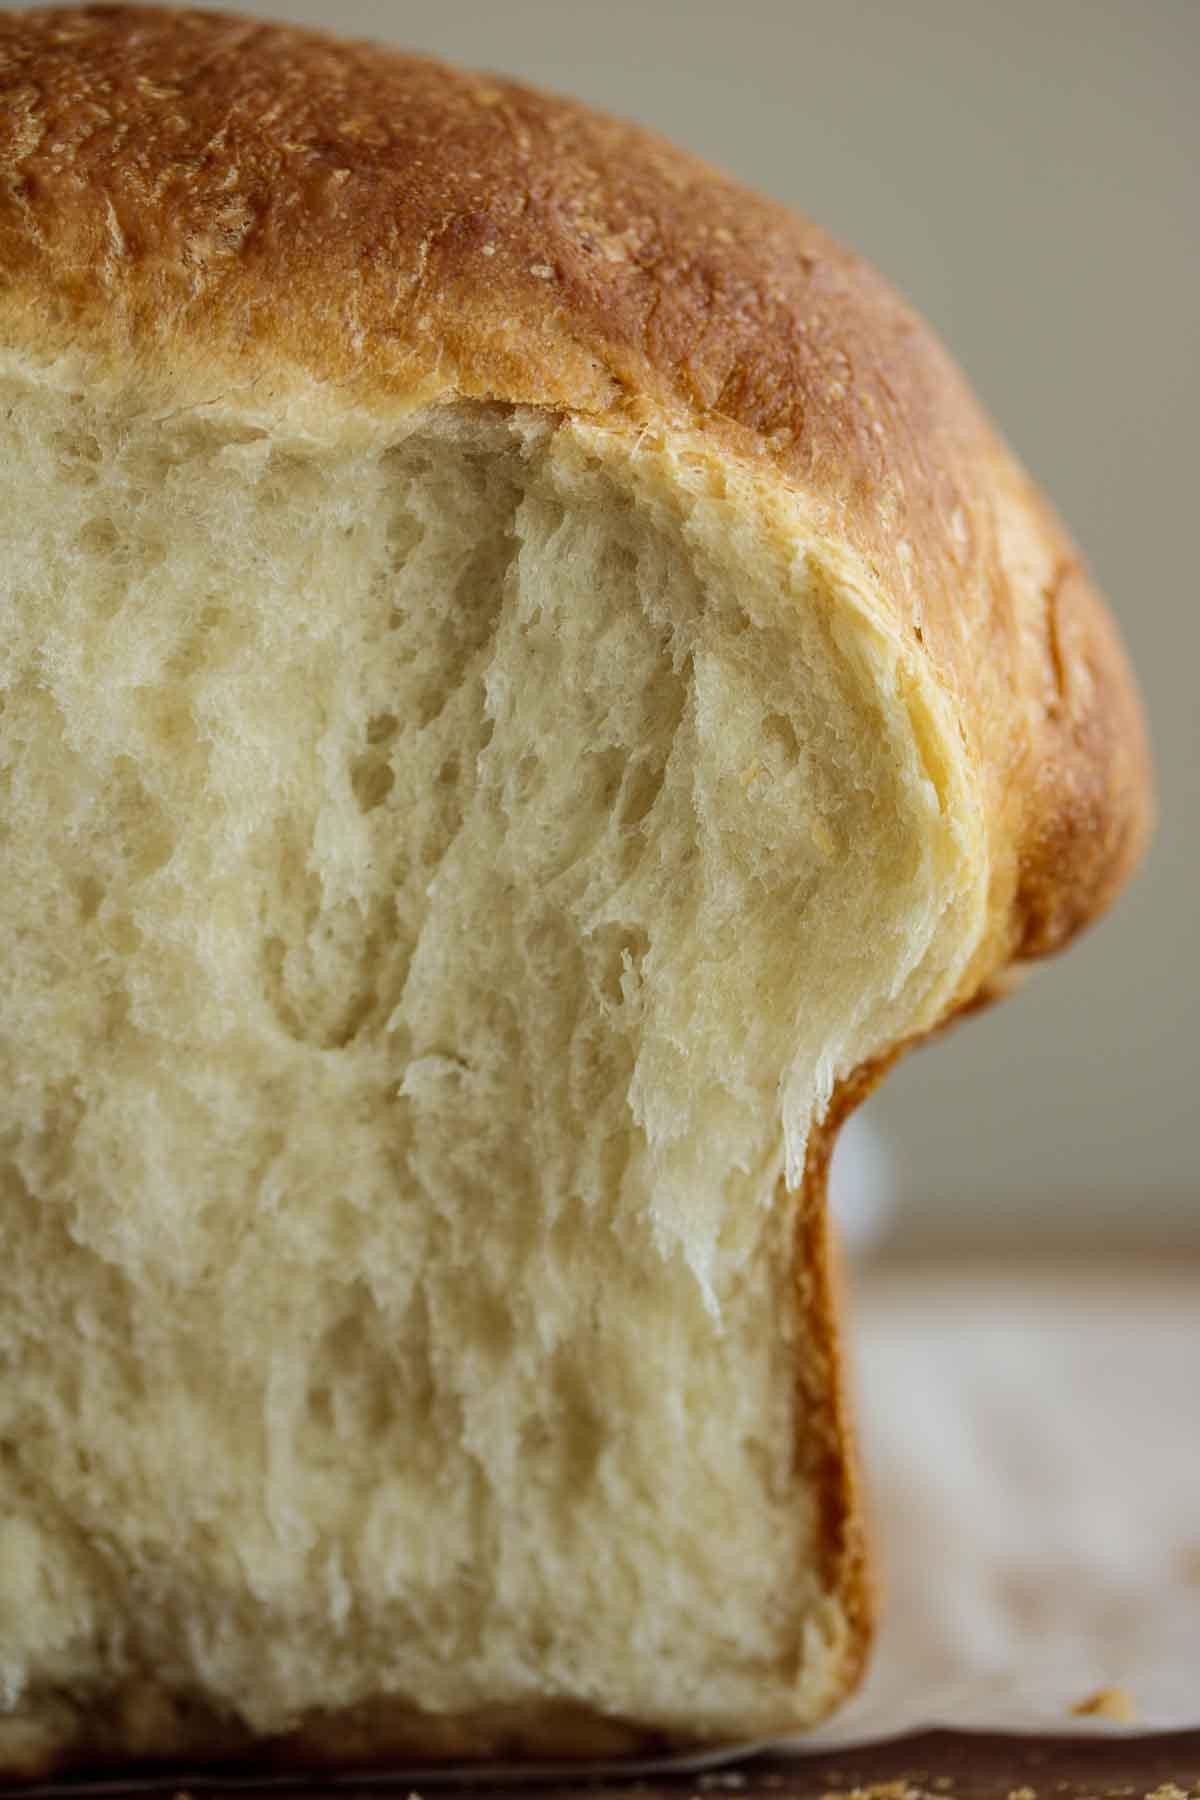 Close up on bread crumb.